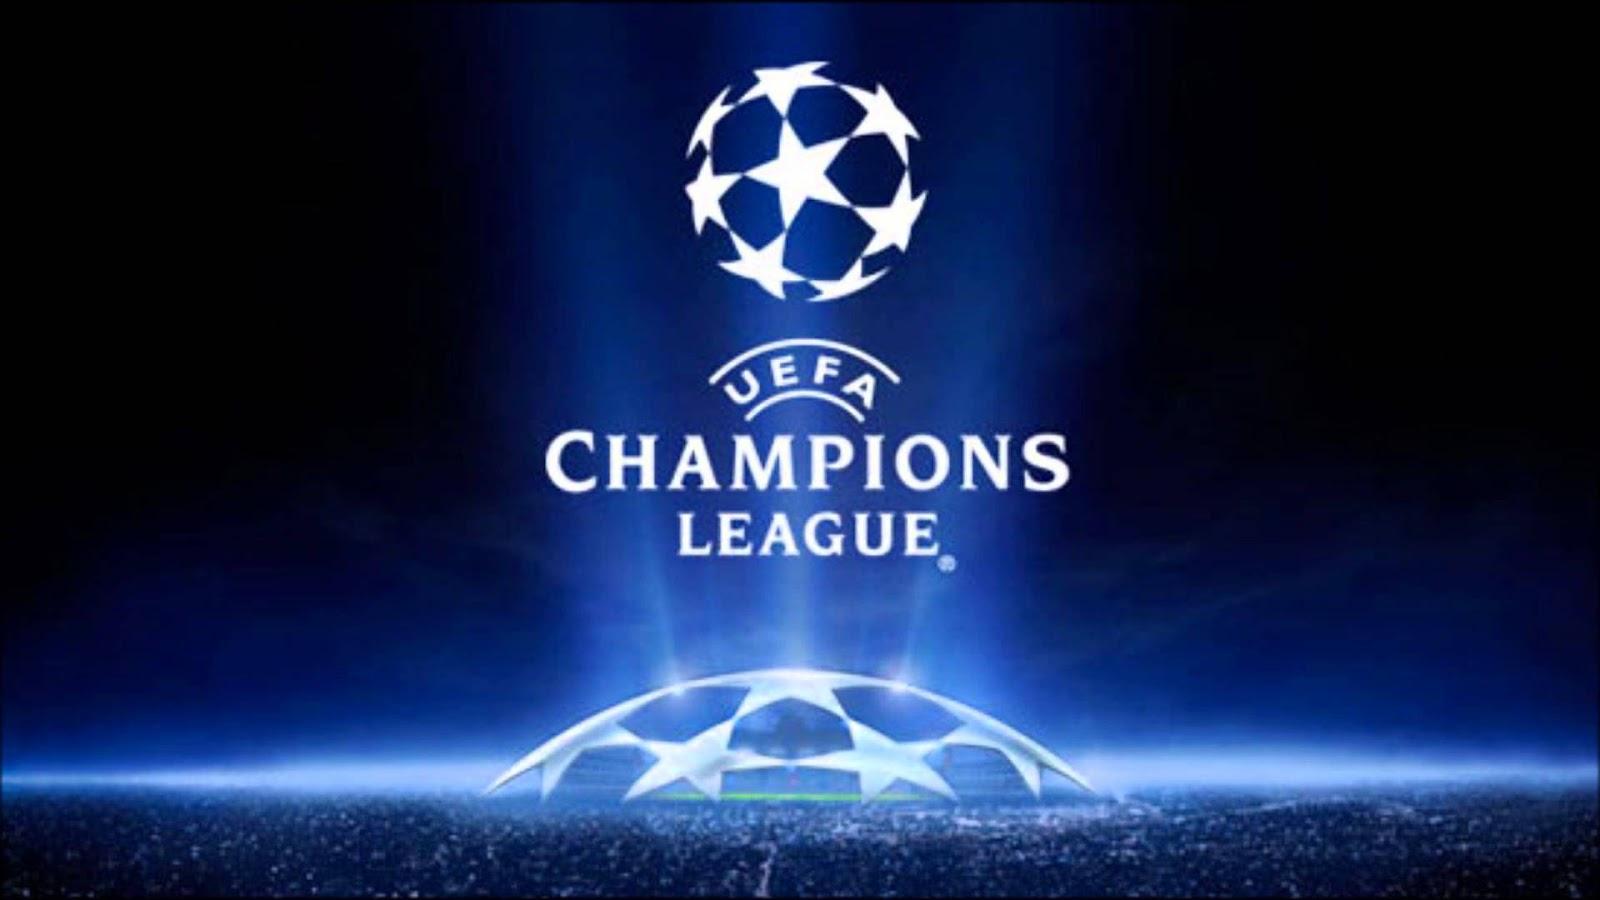 Sorteo De Octavos De Final De La Champions League Dyo